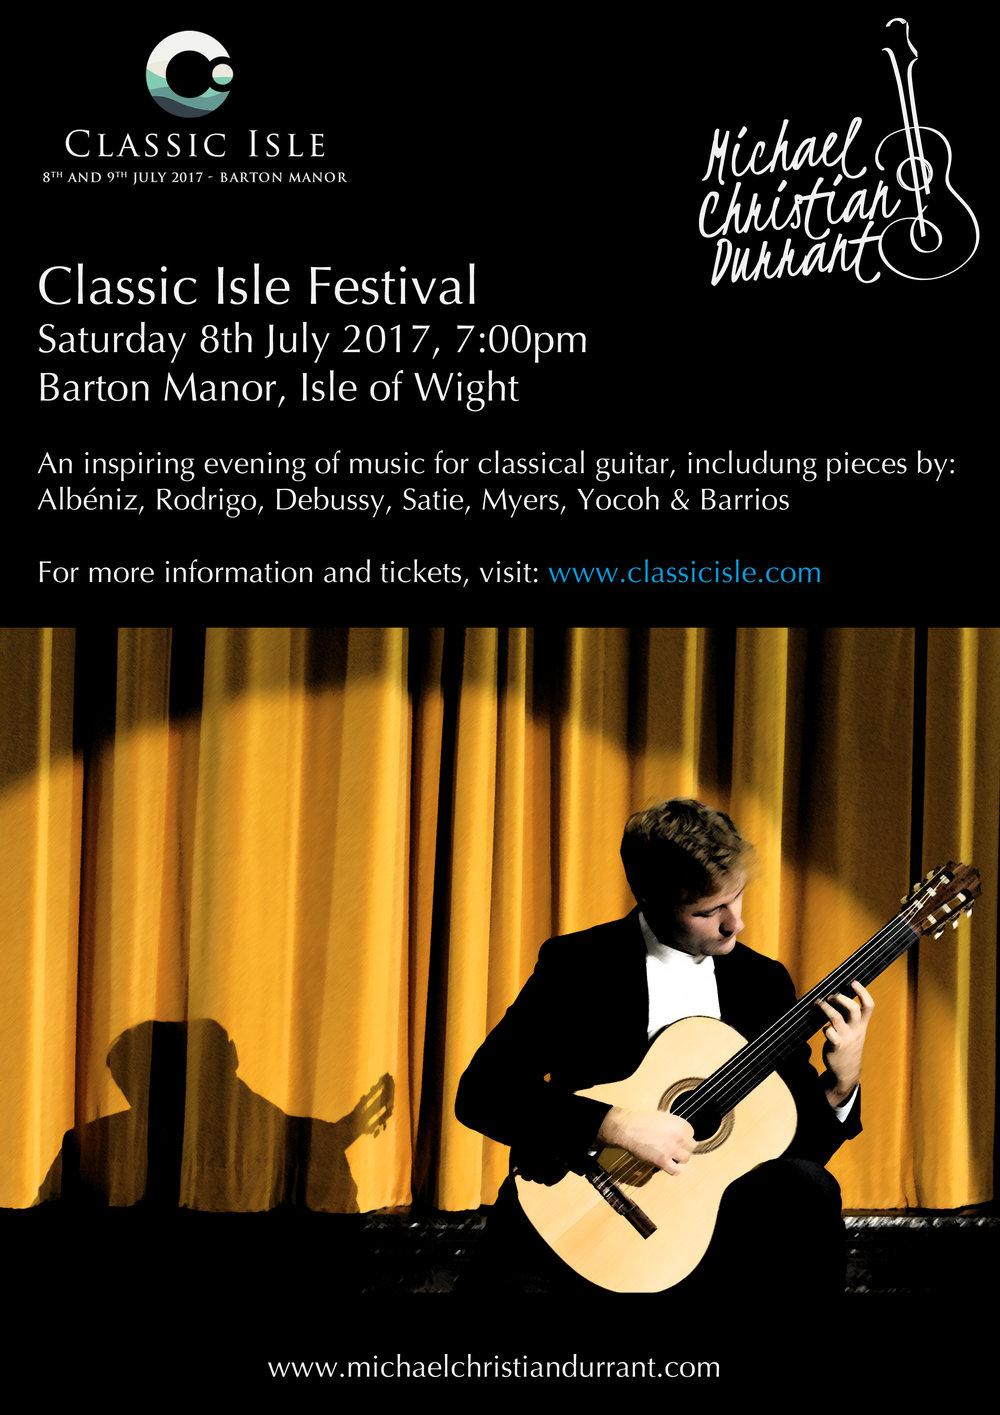 Classic Isle Festival, Saturday 8th July 2017